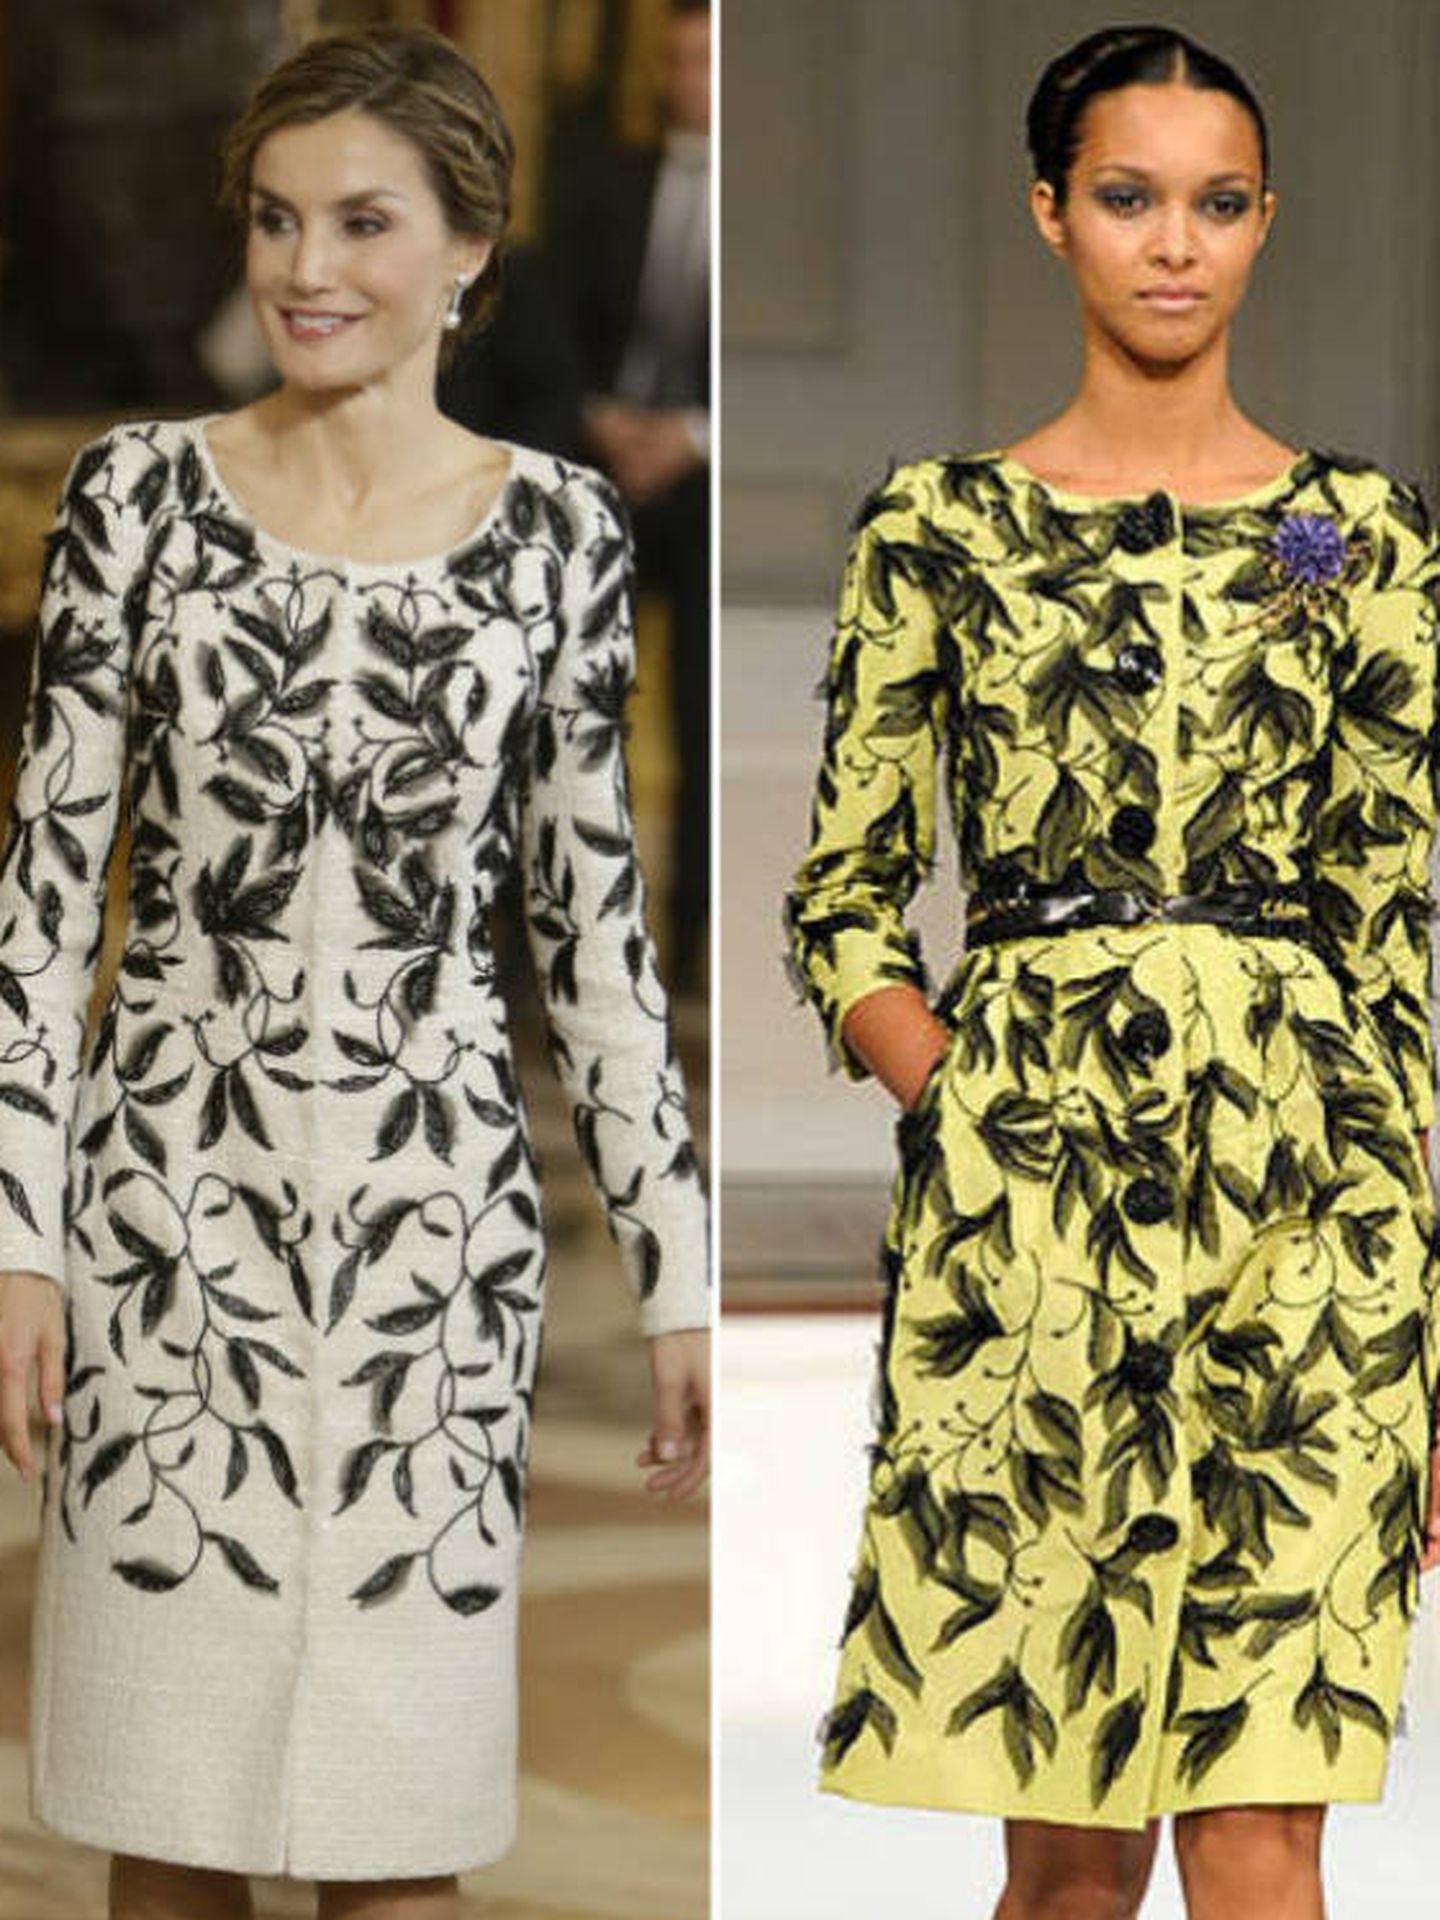 El vestido de la Reina que causó polémica.   (Montaje Vanitatis)